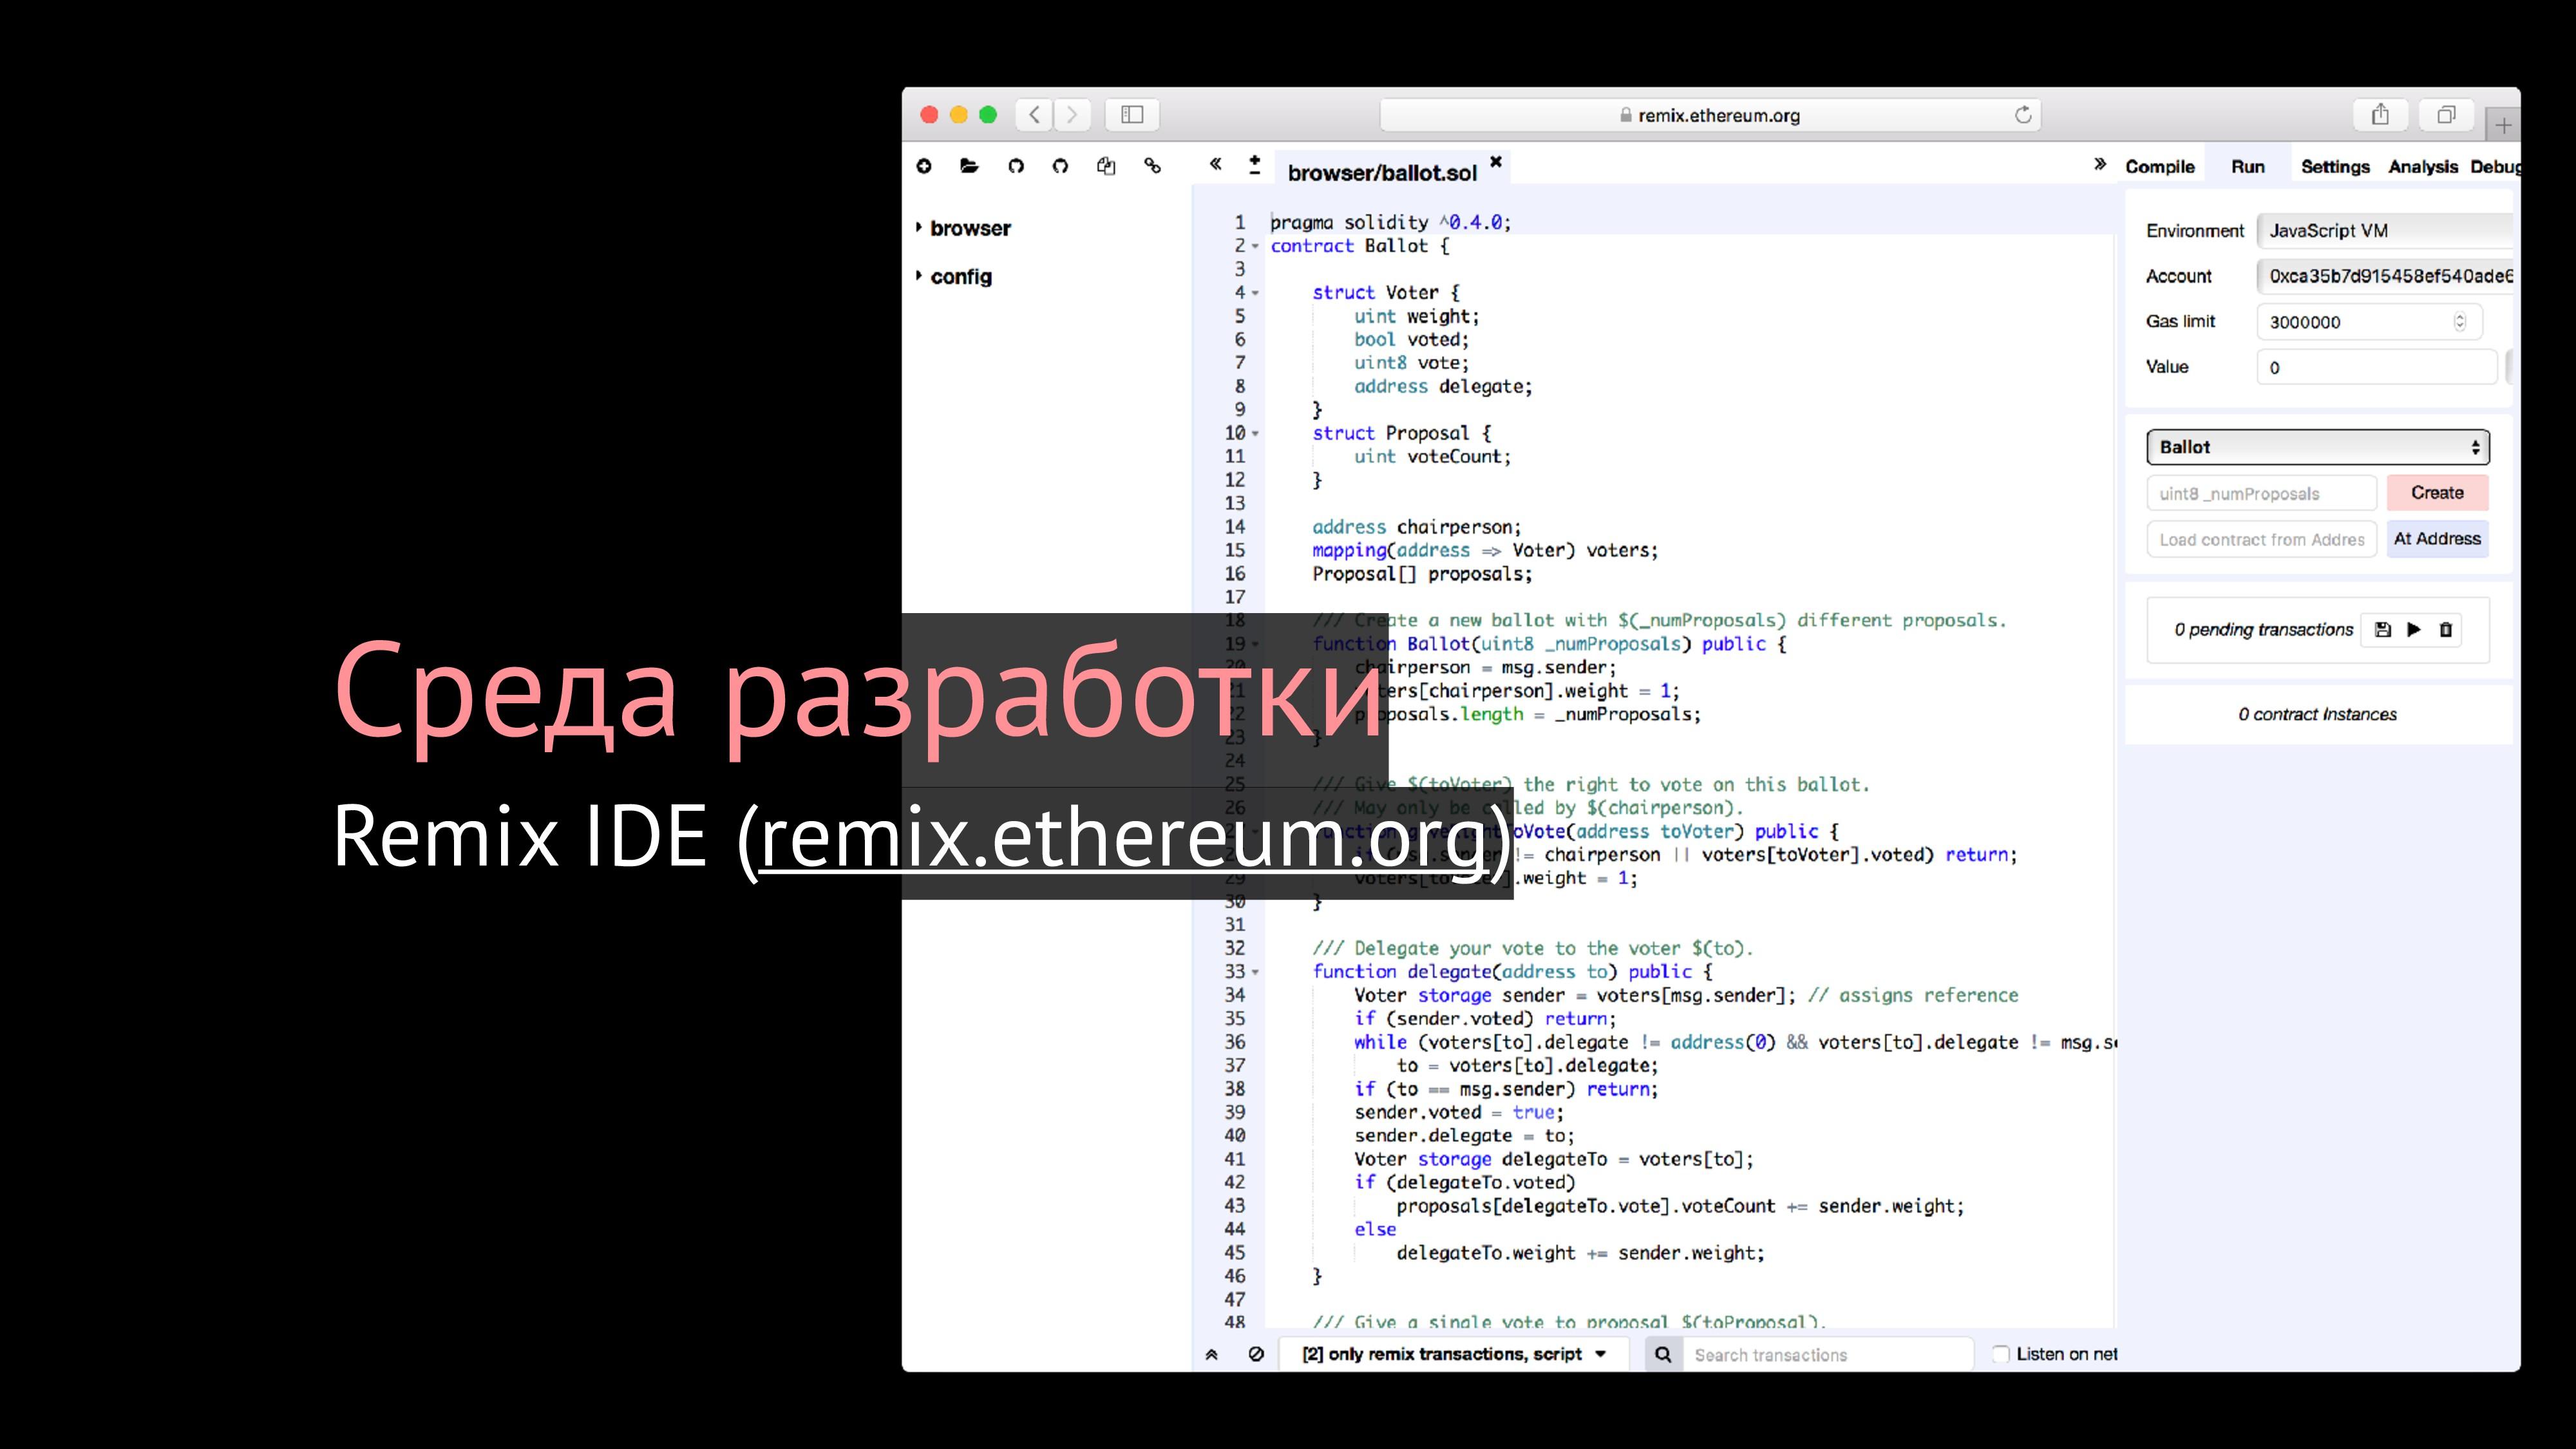 Среда разработки Remix IDE (remix.ethereum.org)